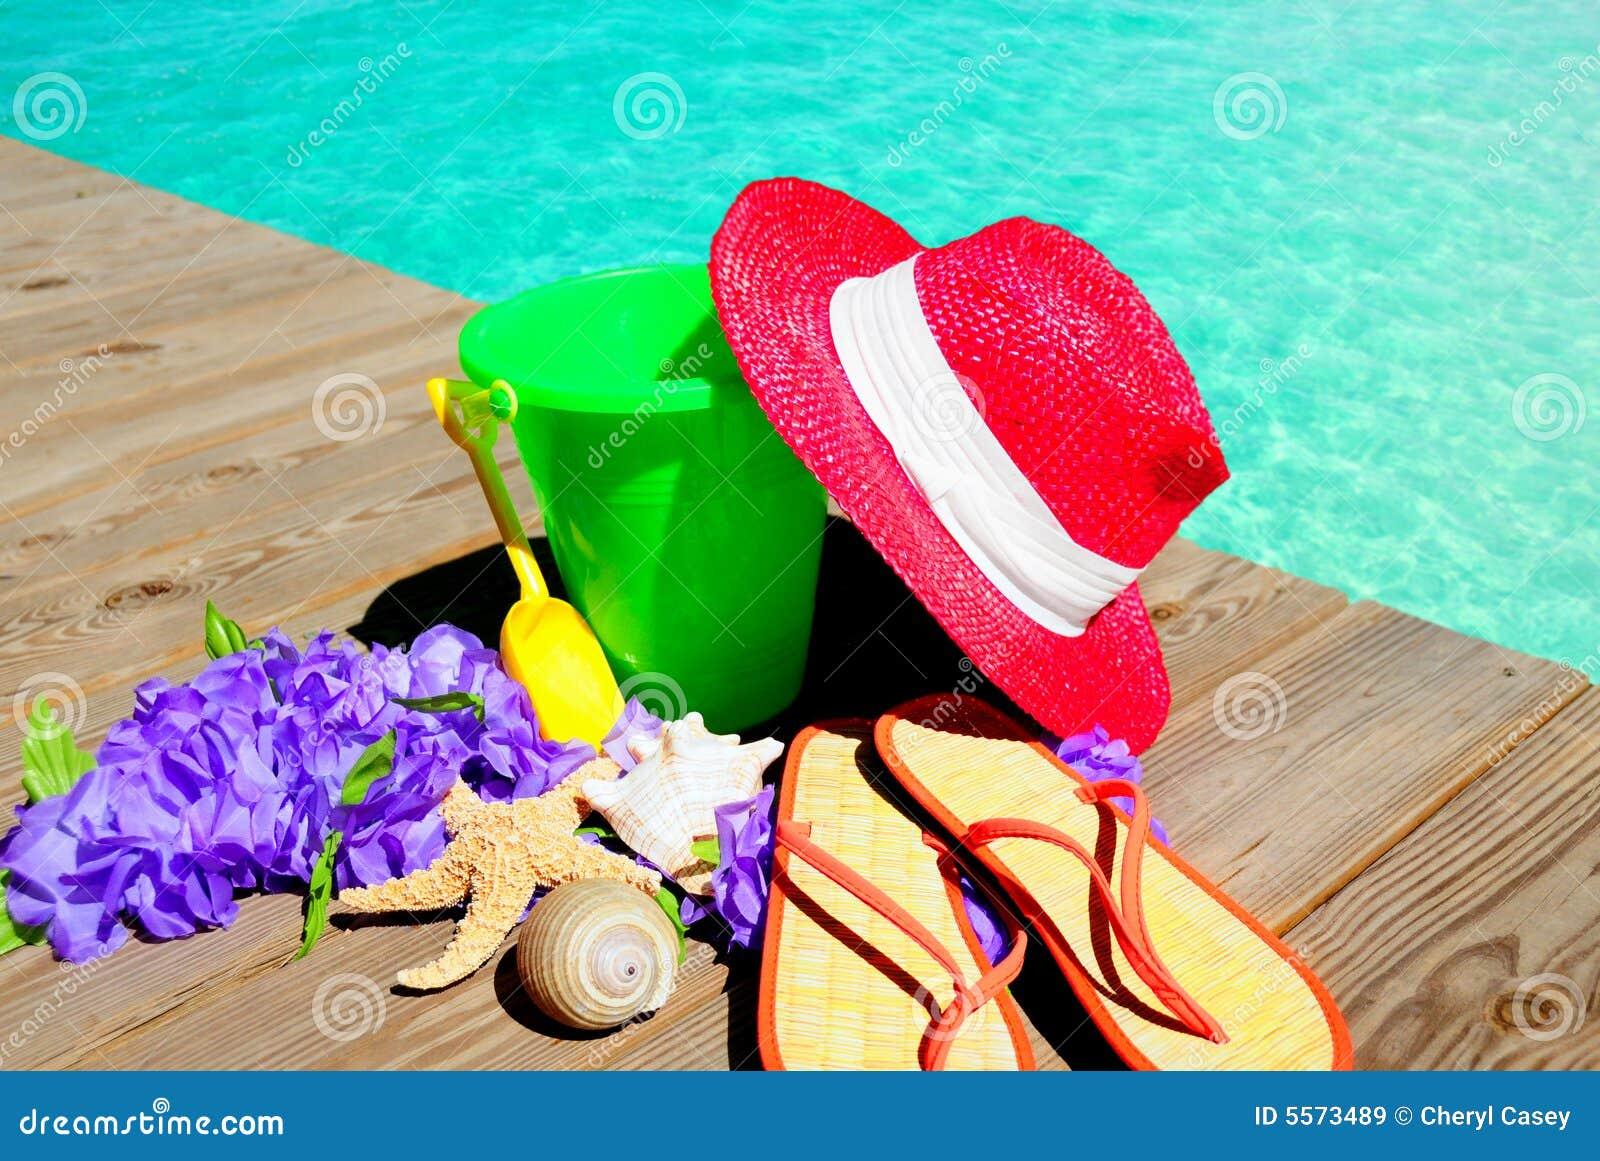 Items de la playa de Pool